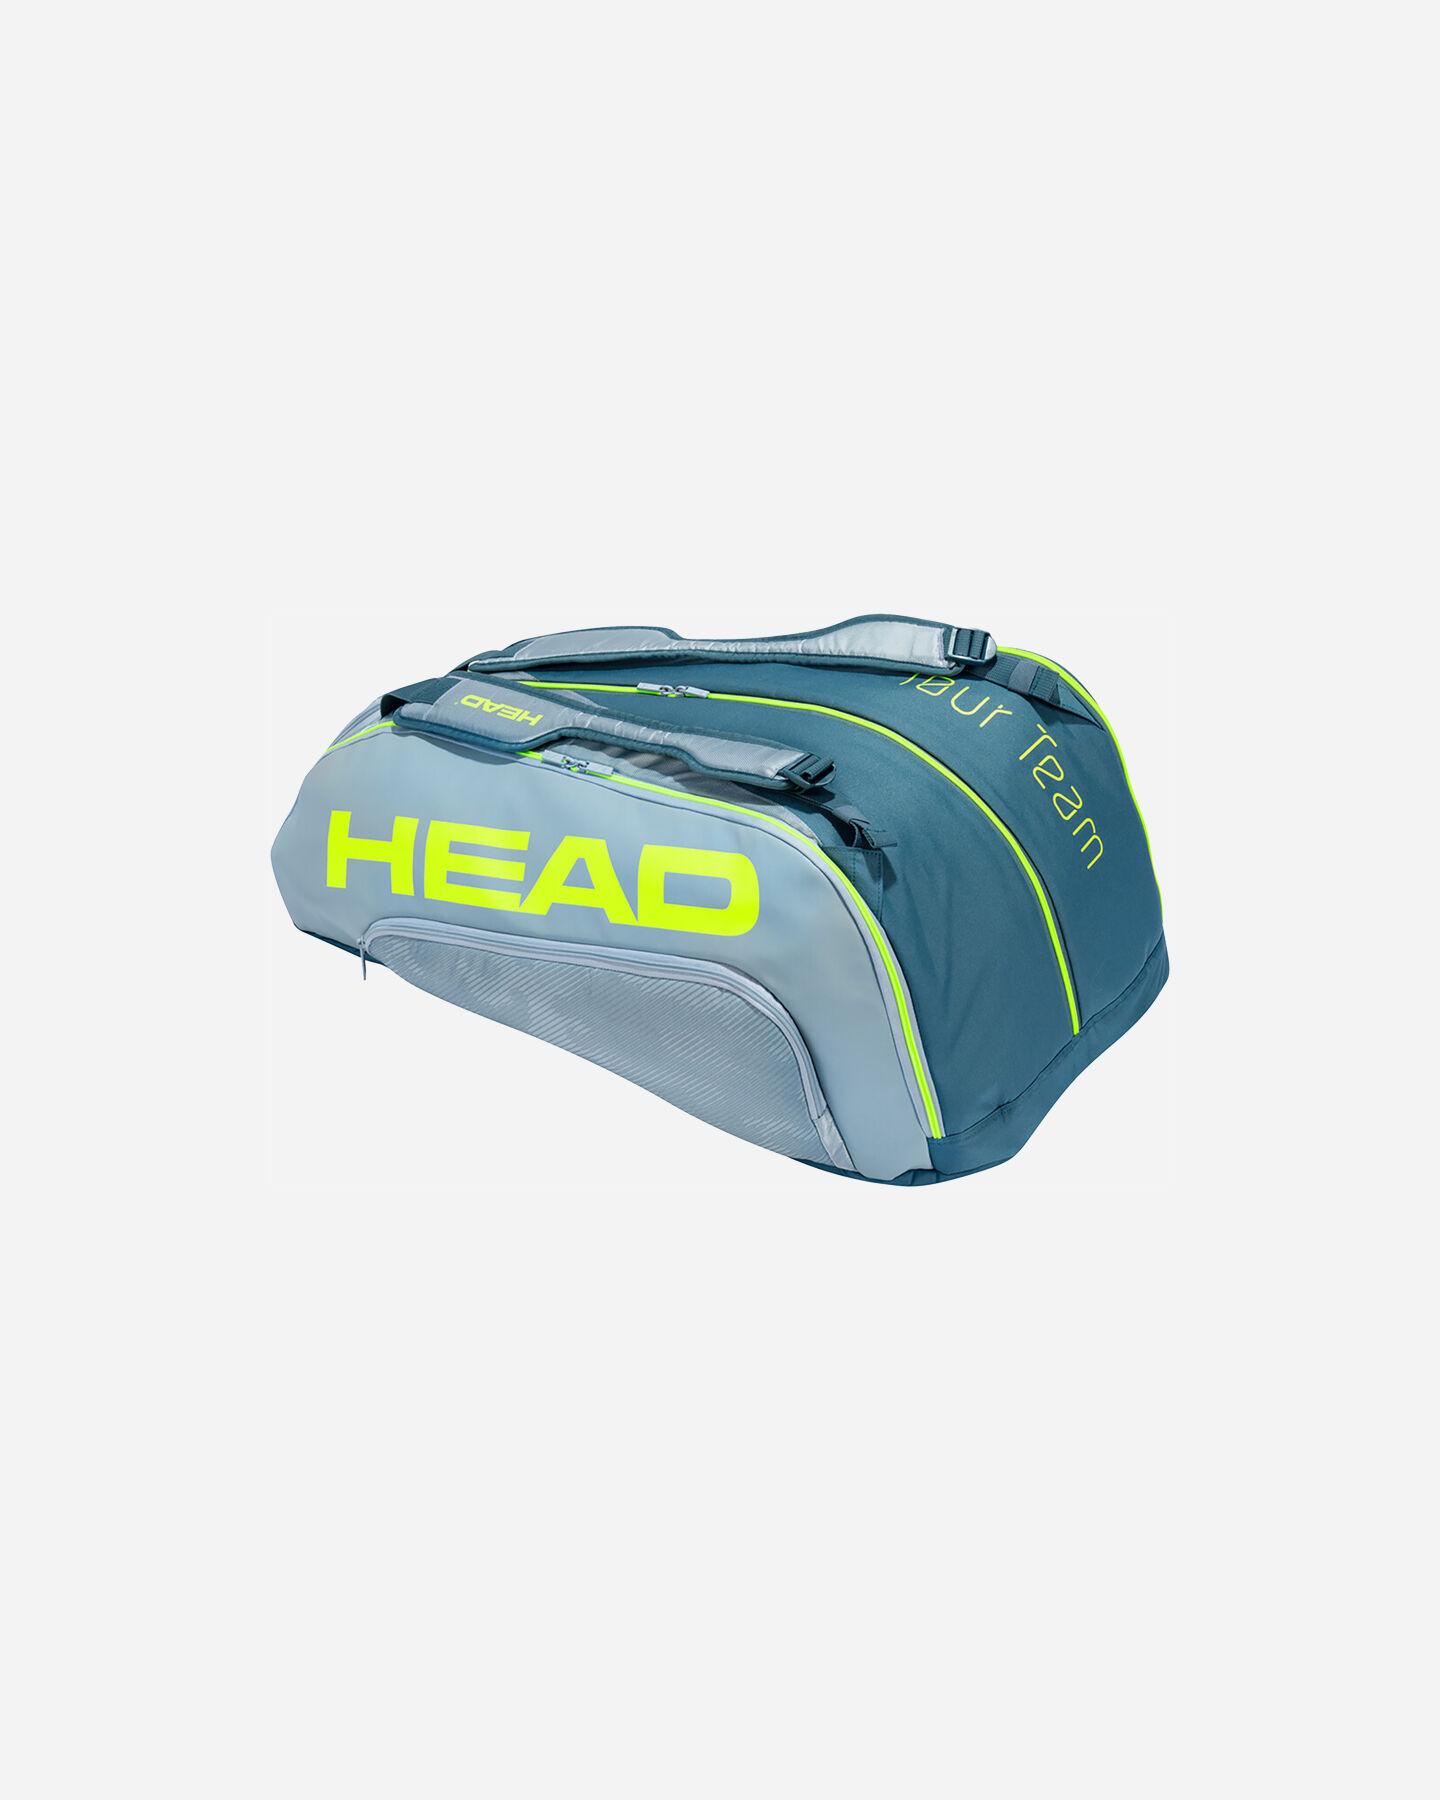 Fodero HEAD FODERO HEAD EXTREME TOUR TEAM R12 GRNY S5303121 GRNY UNI scatto 1